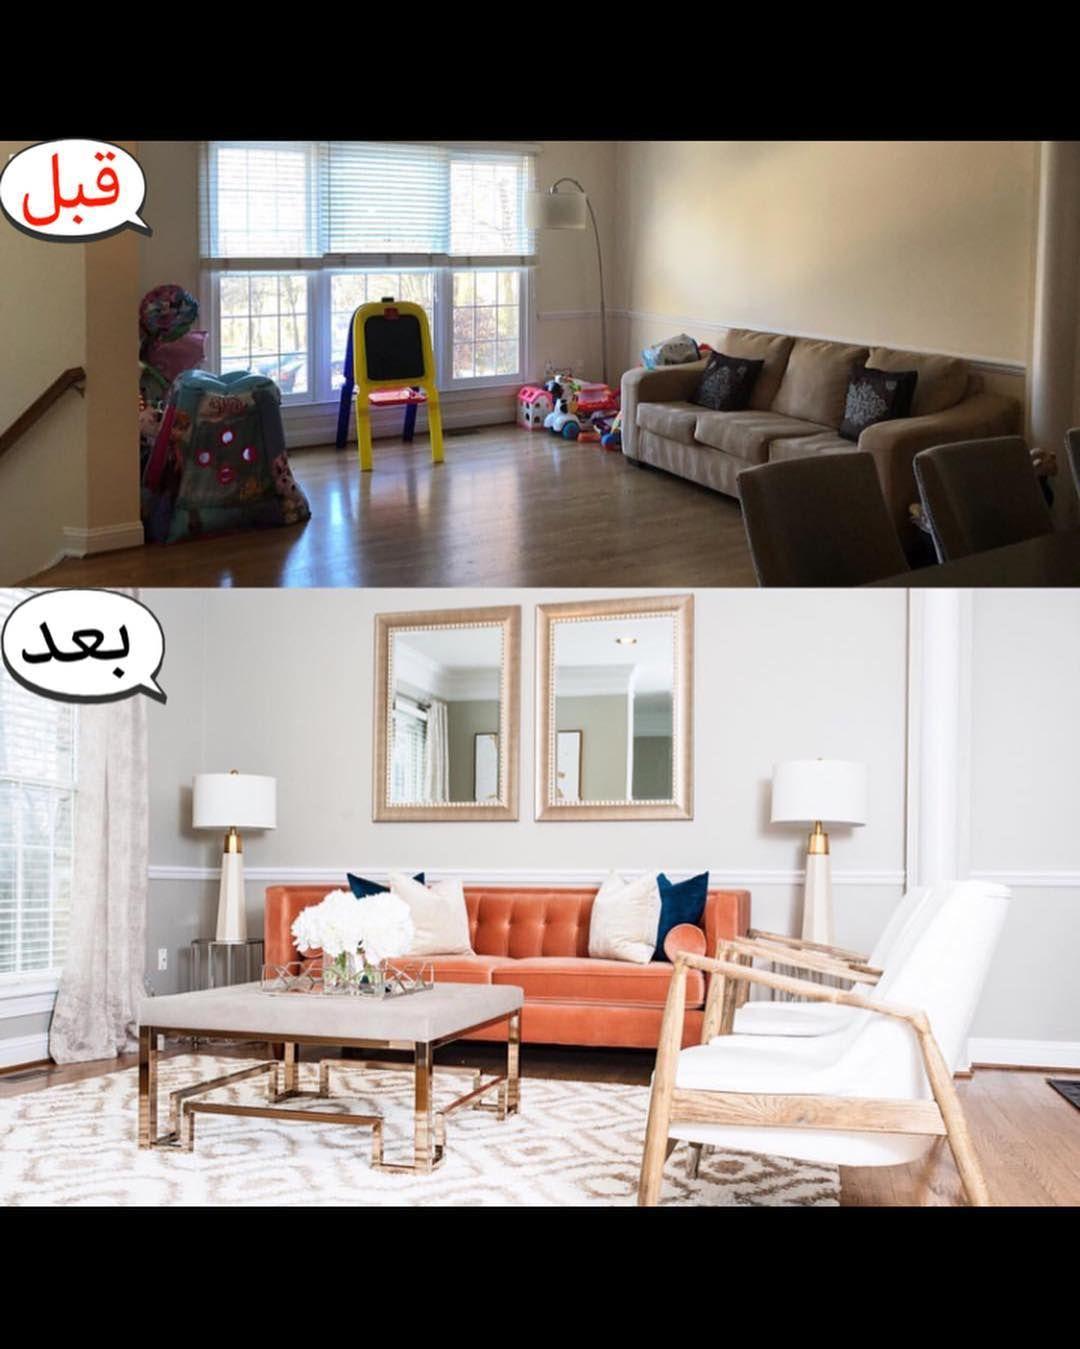 New The 10 Best Home Decor With Pictures رايكم في التغييير لطلب مبخرة احلام مباشره عبر الواتس اب 056 Home Decor Decor Room Makeover